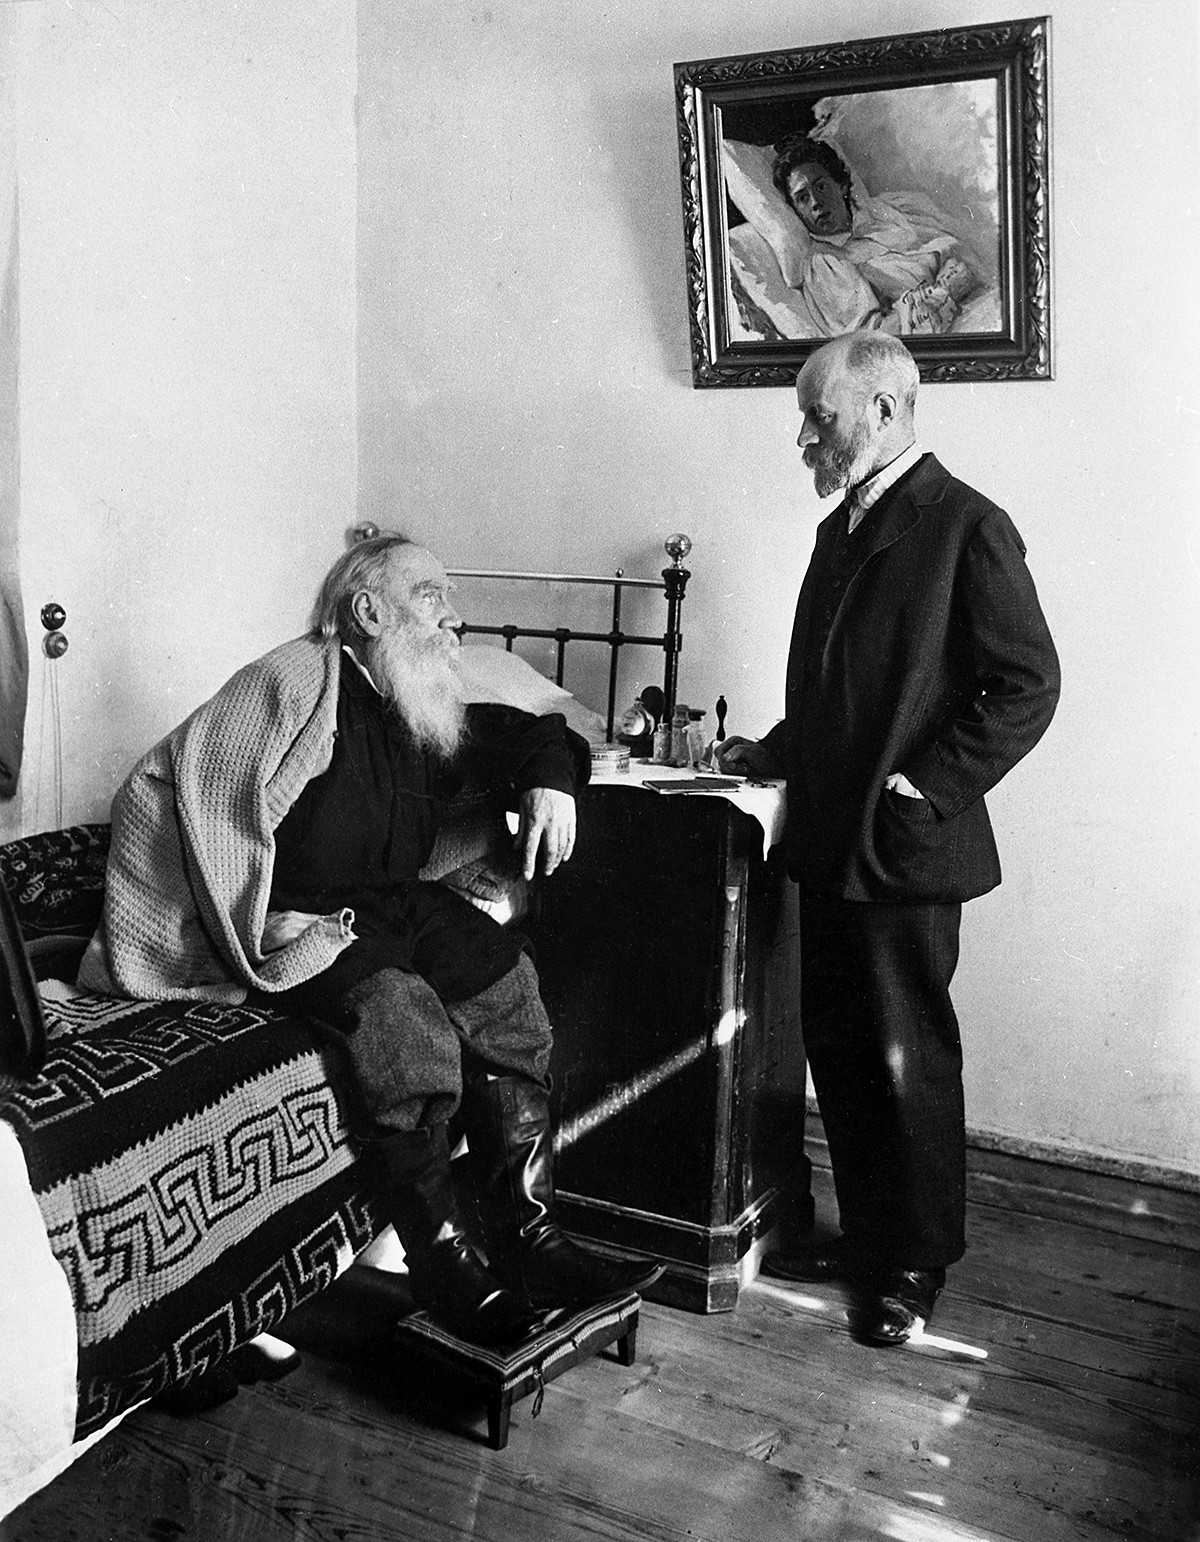 Tolstoy and his doctor, Makovitsky in Yasnaya Polyana, 1909